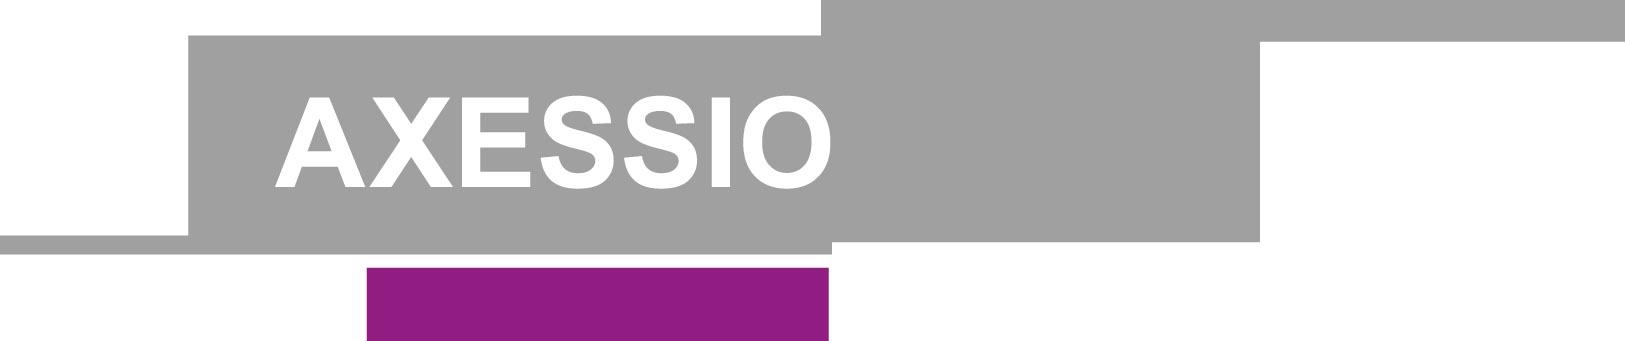 log-AXESSIO